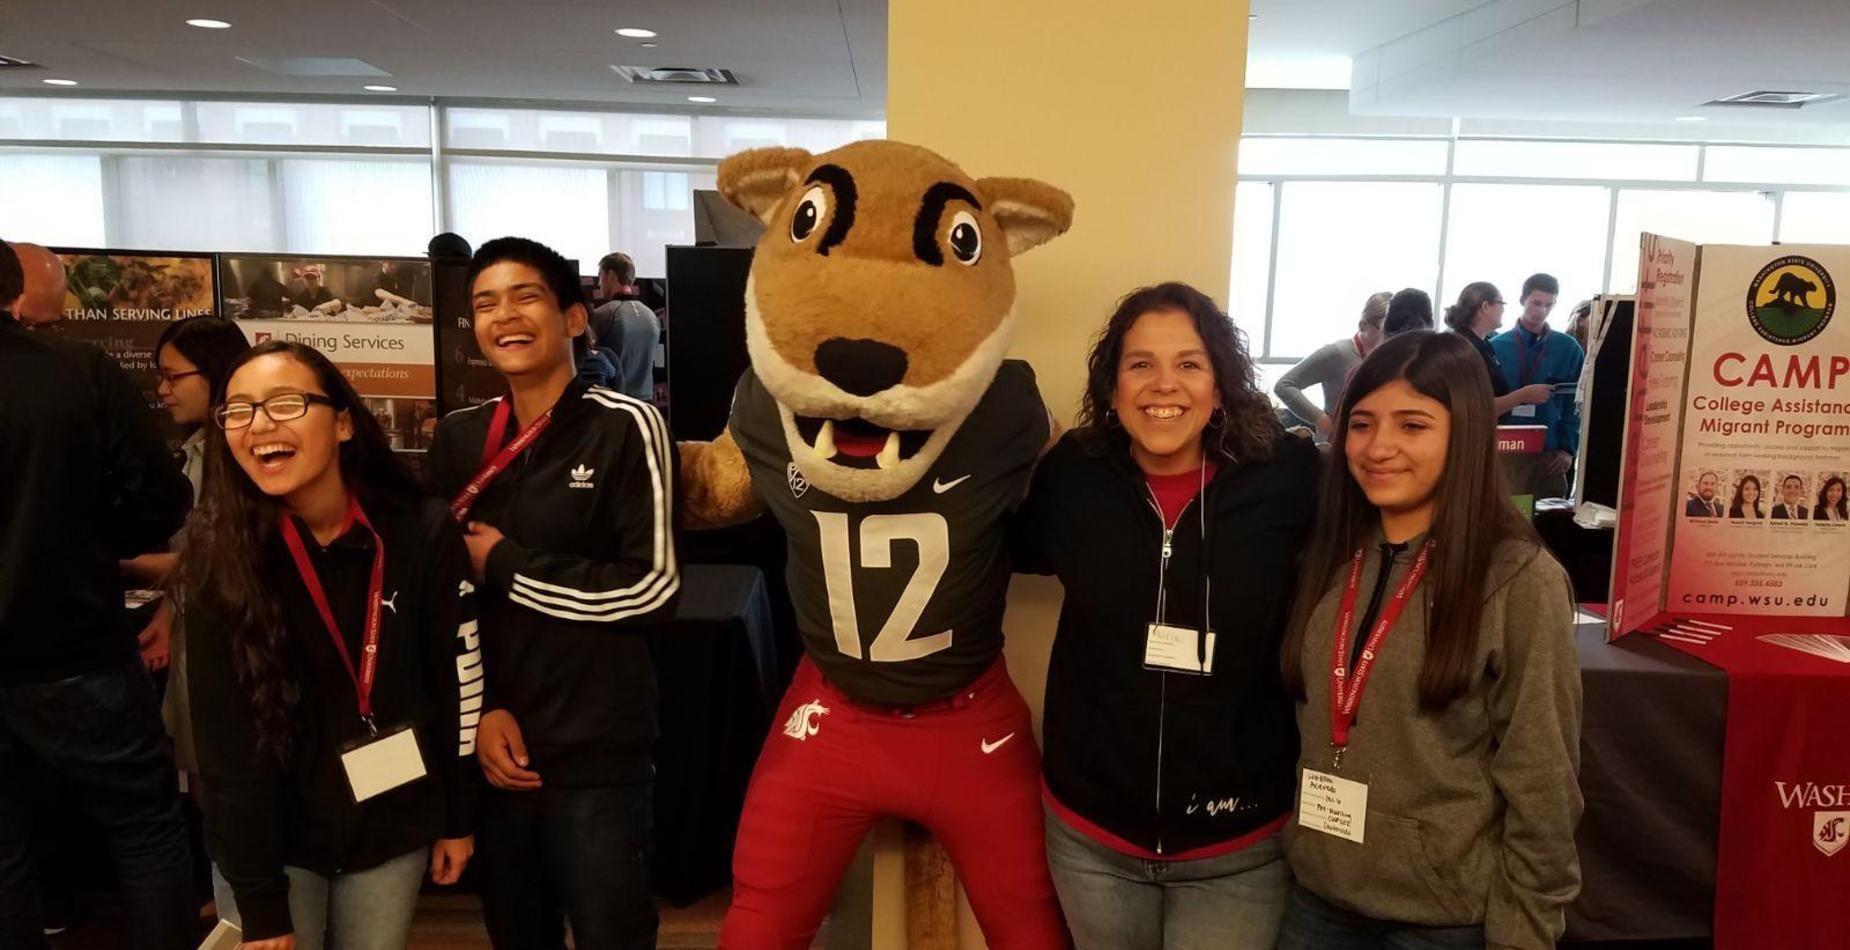 Ms. Maldonado and students at WSU